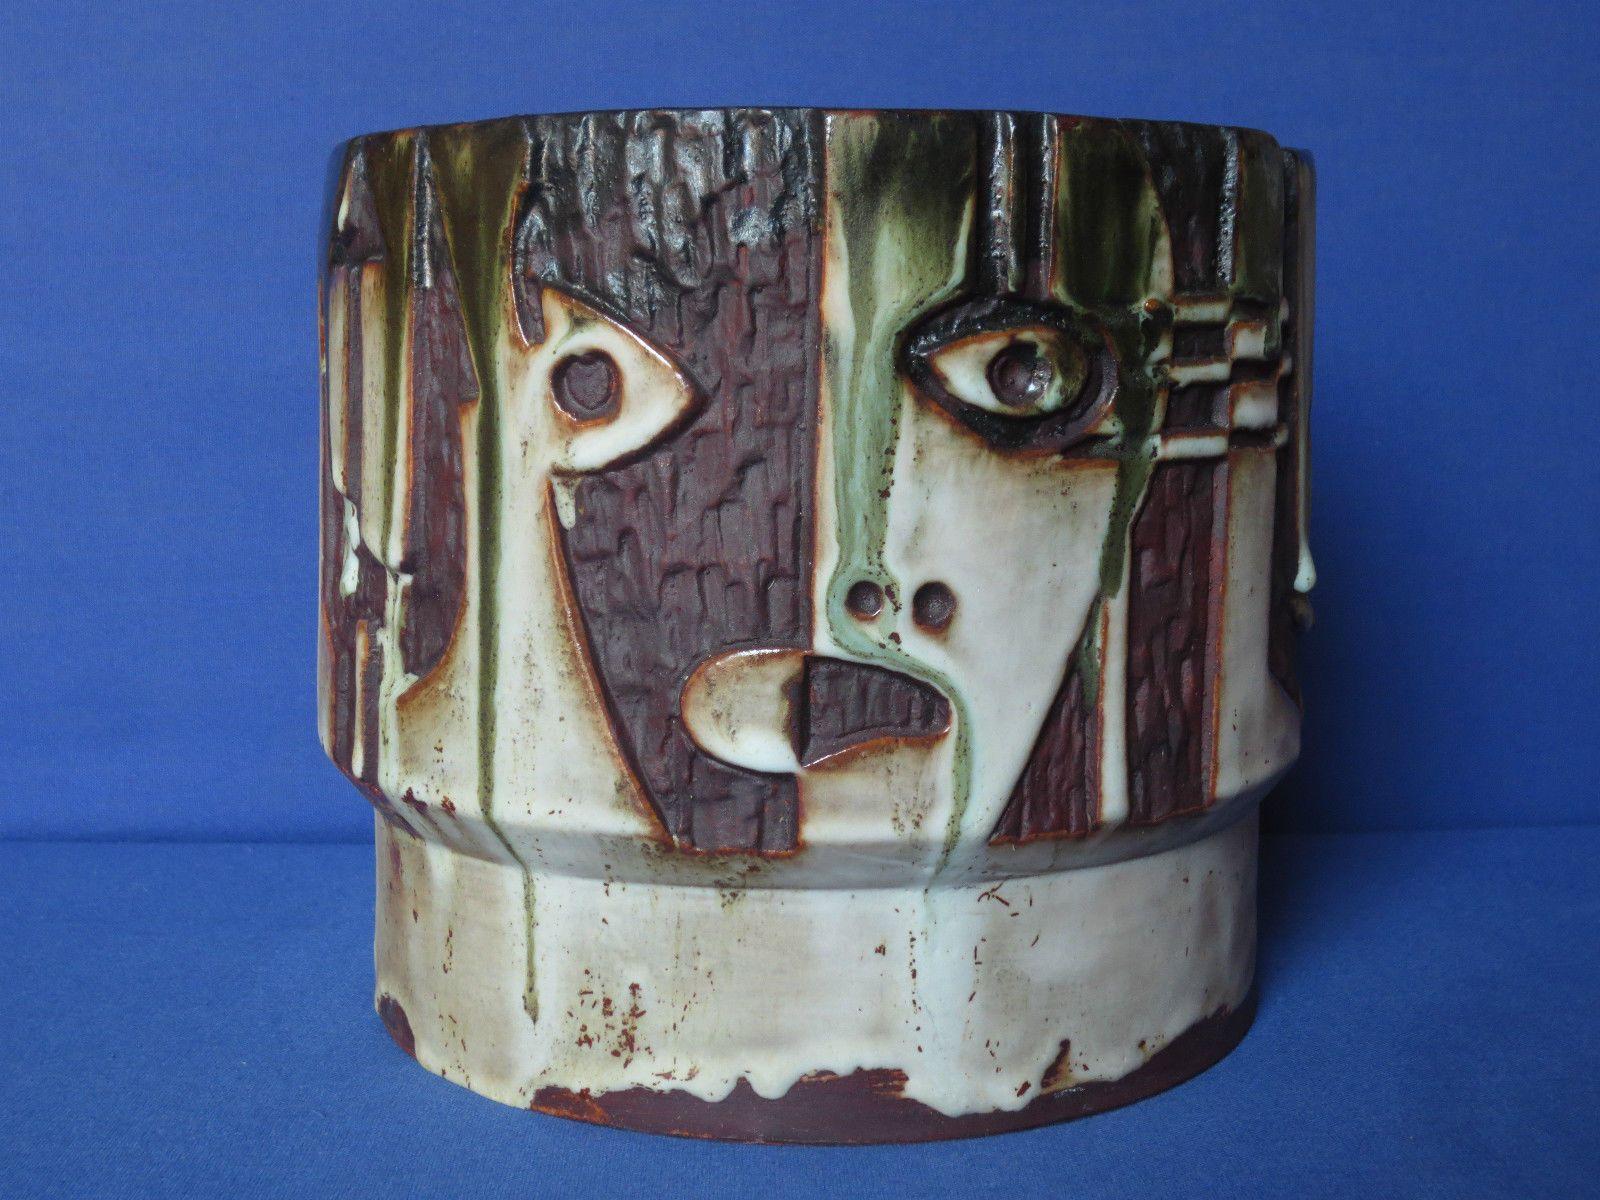 / Gesichter in Antiquitäten & Kunst, Porzellan & Keramik, Keramik | eBay